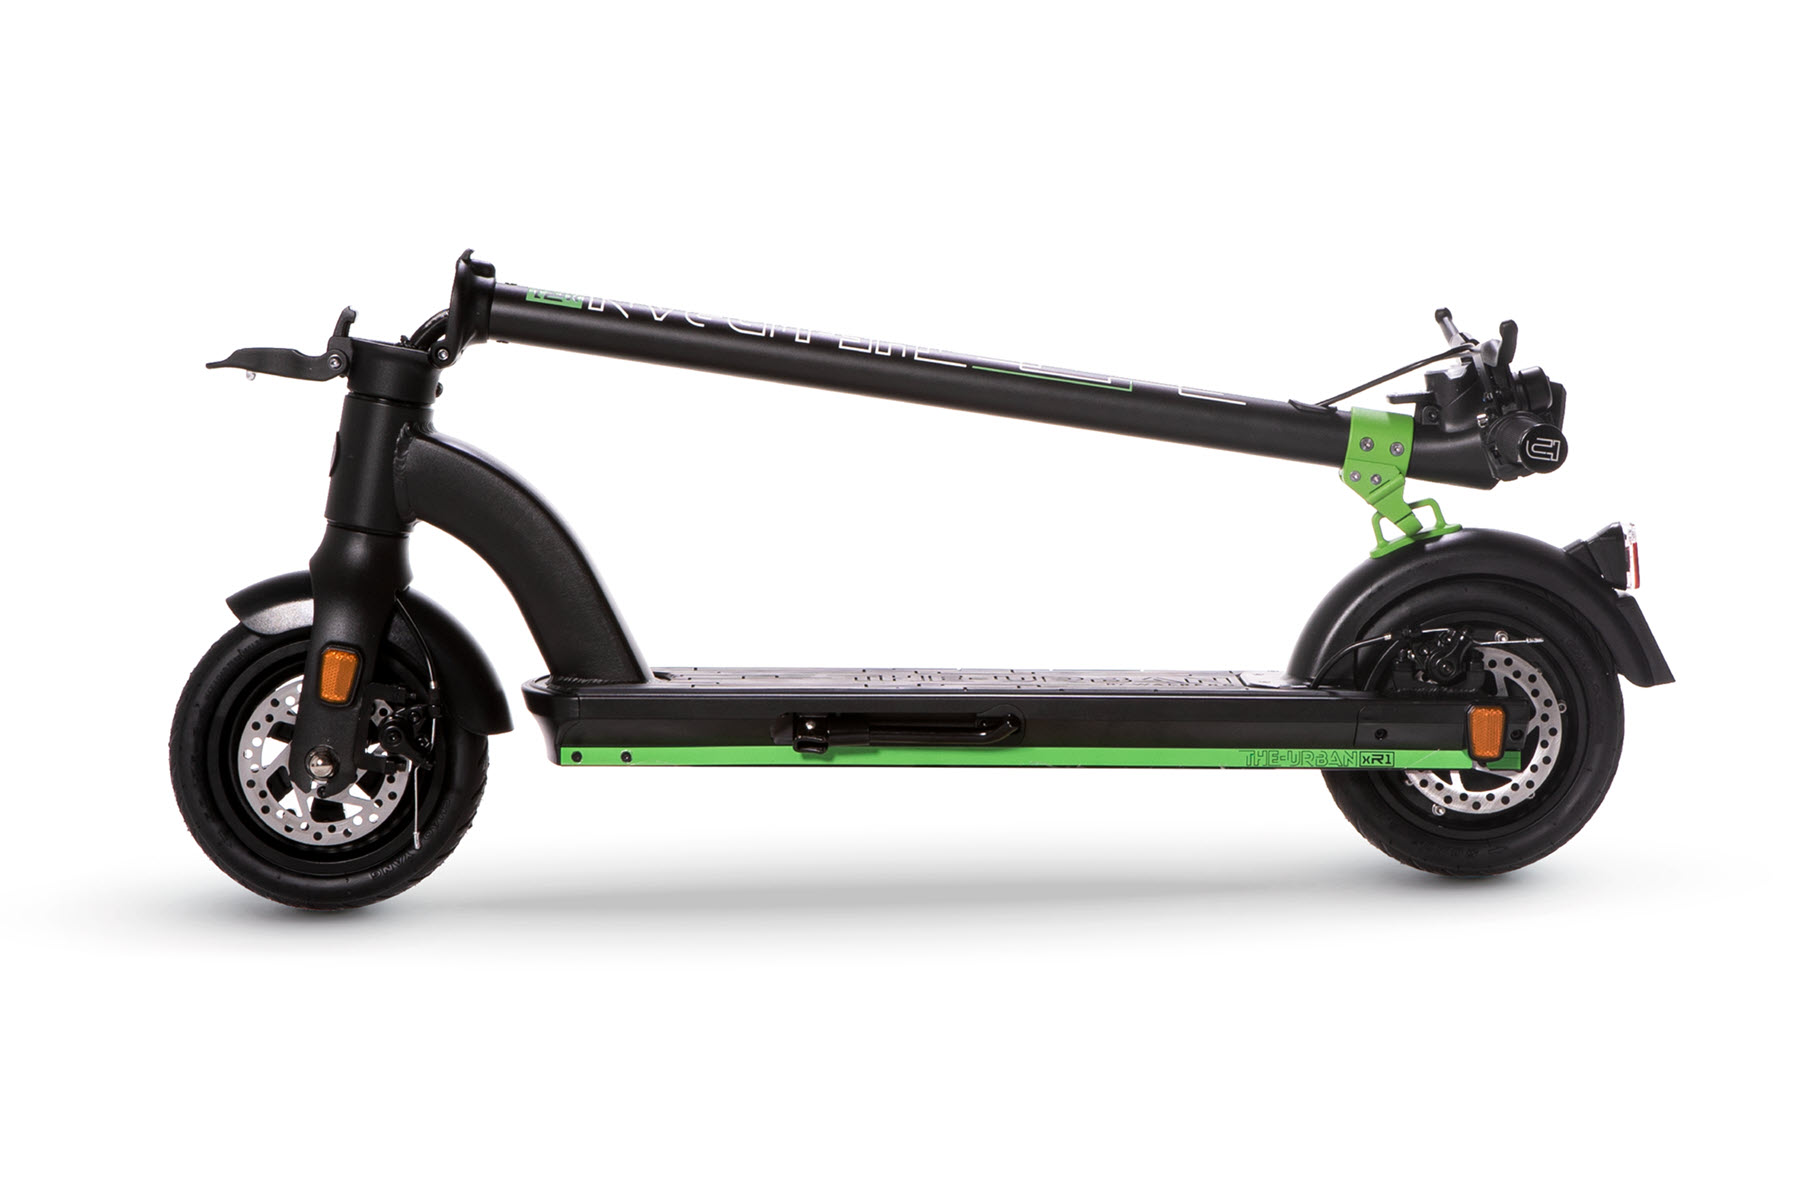 E-Scooter THE-URBAN xR1 mit Straßenzulassung nach eKFV